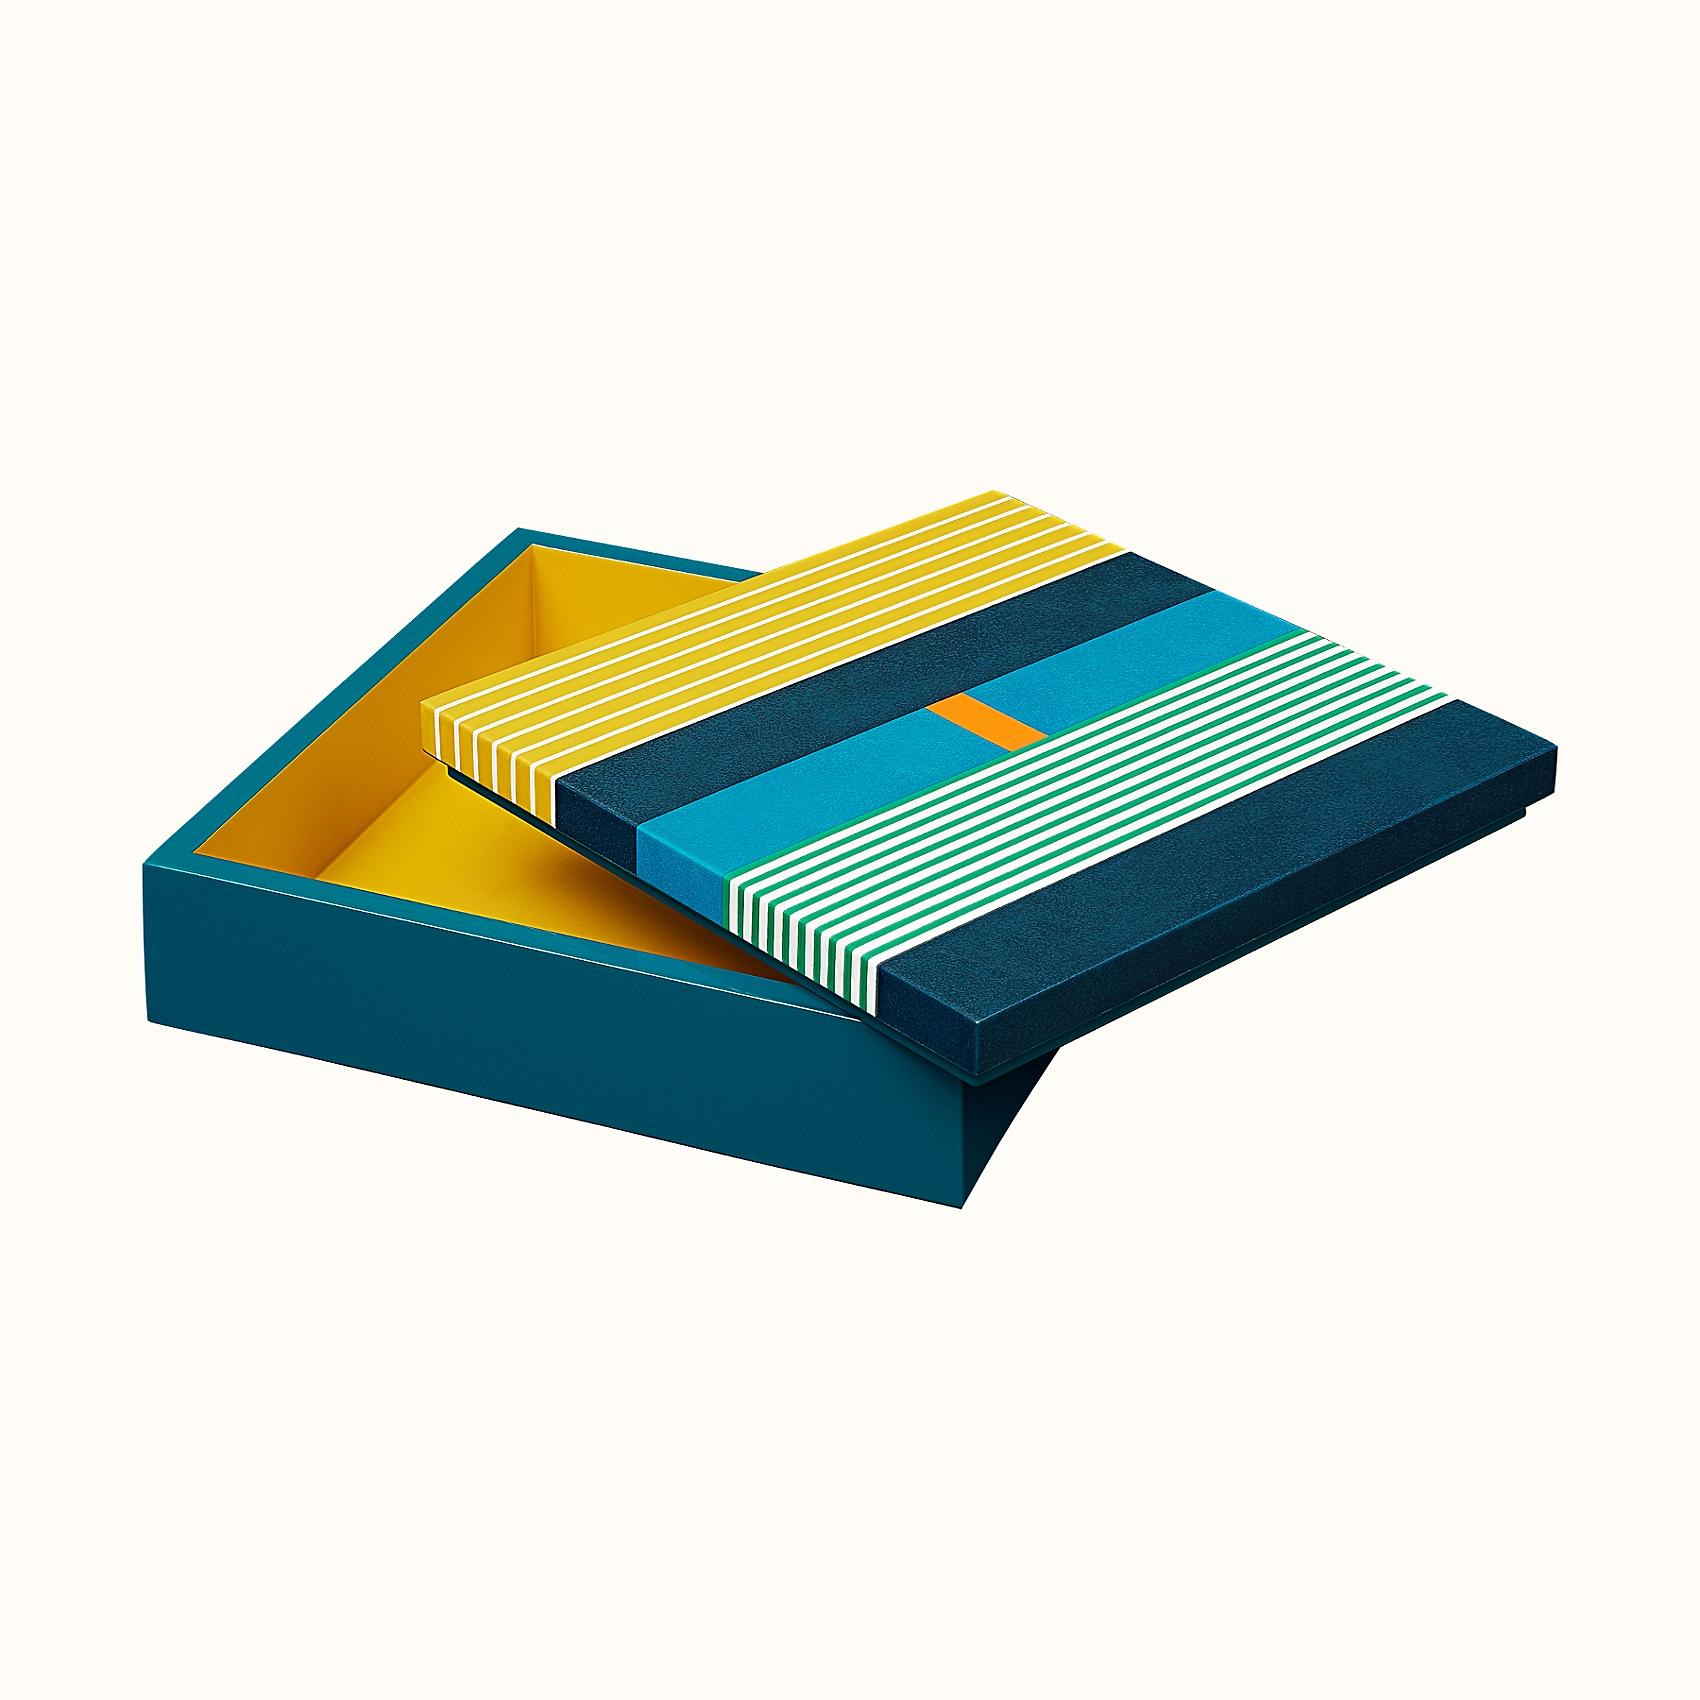 HERMES Theoreme H Vibration box, medium model - Bleu Luzien